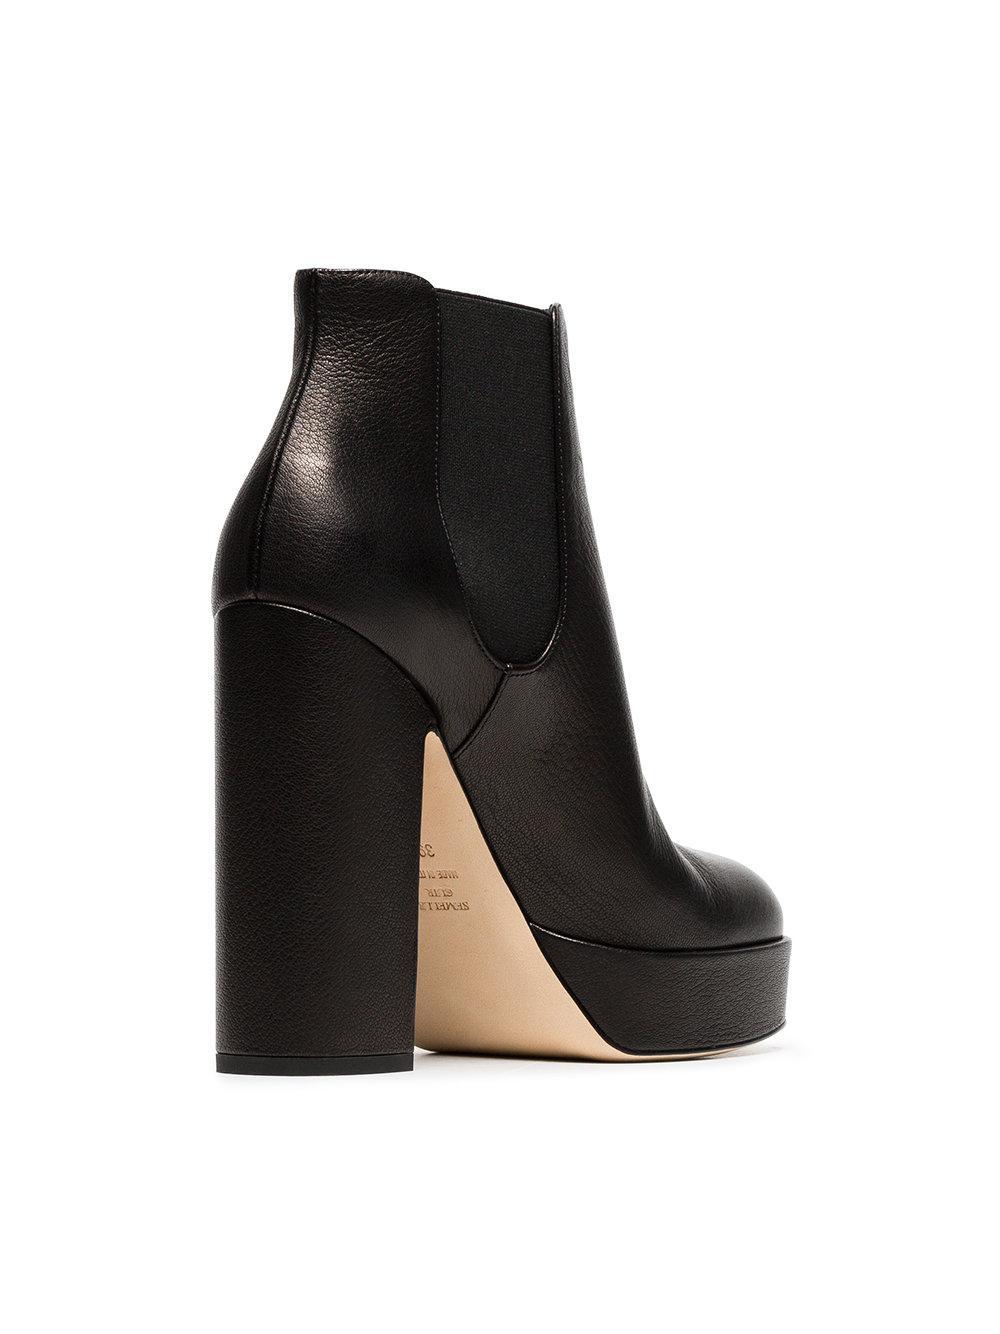 0e1cb241b07 Laurence Dacade - Black Rosa 120 Leather Platform Boots - Lyst. View  fullscreen